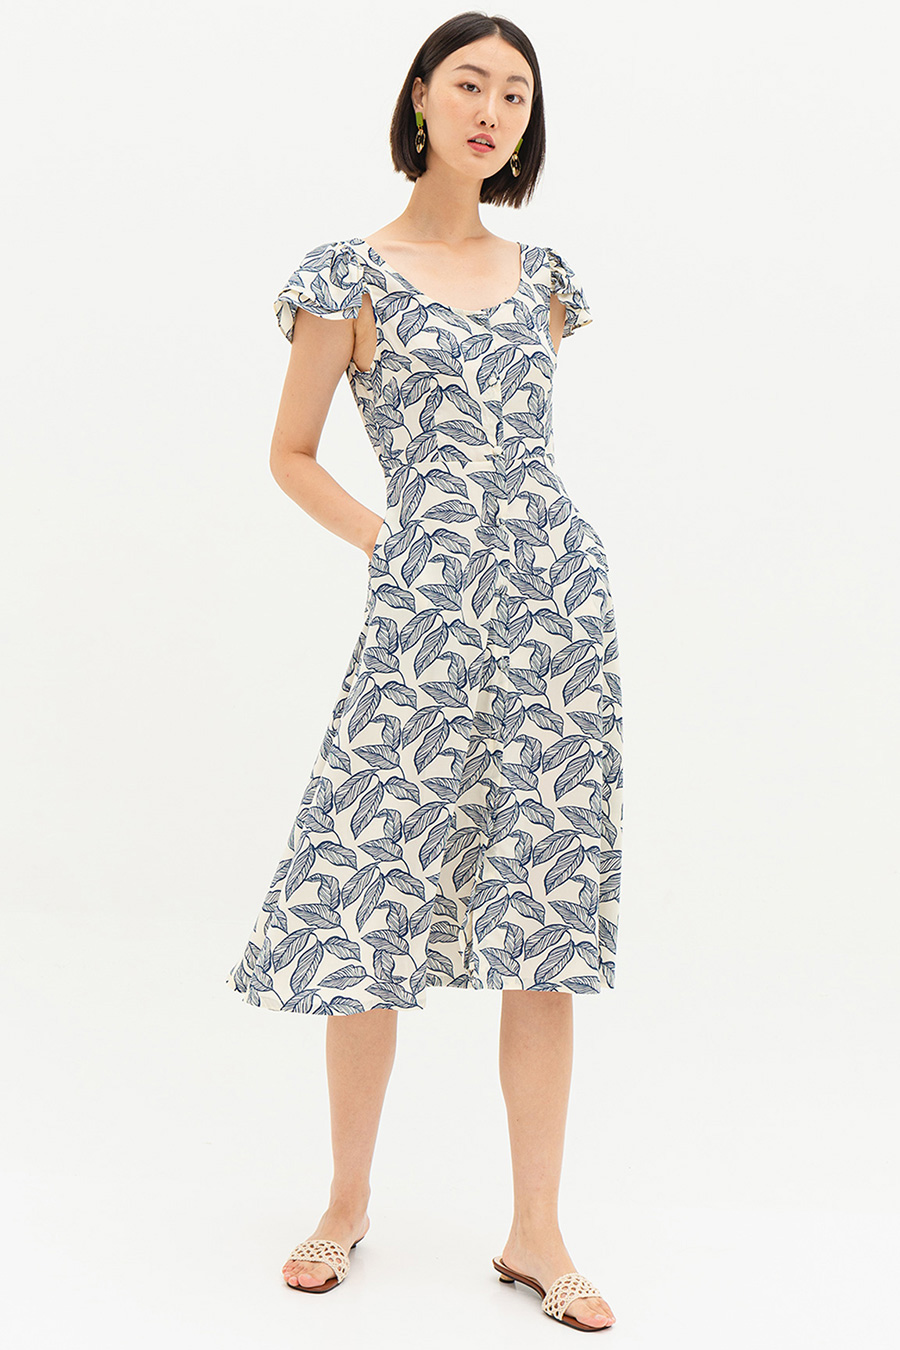 *SALE* KERITH DRESS - NABANA [BY MODPARADE]